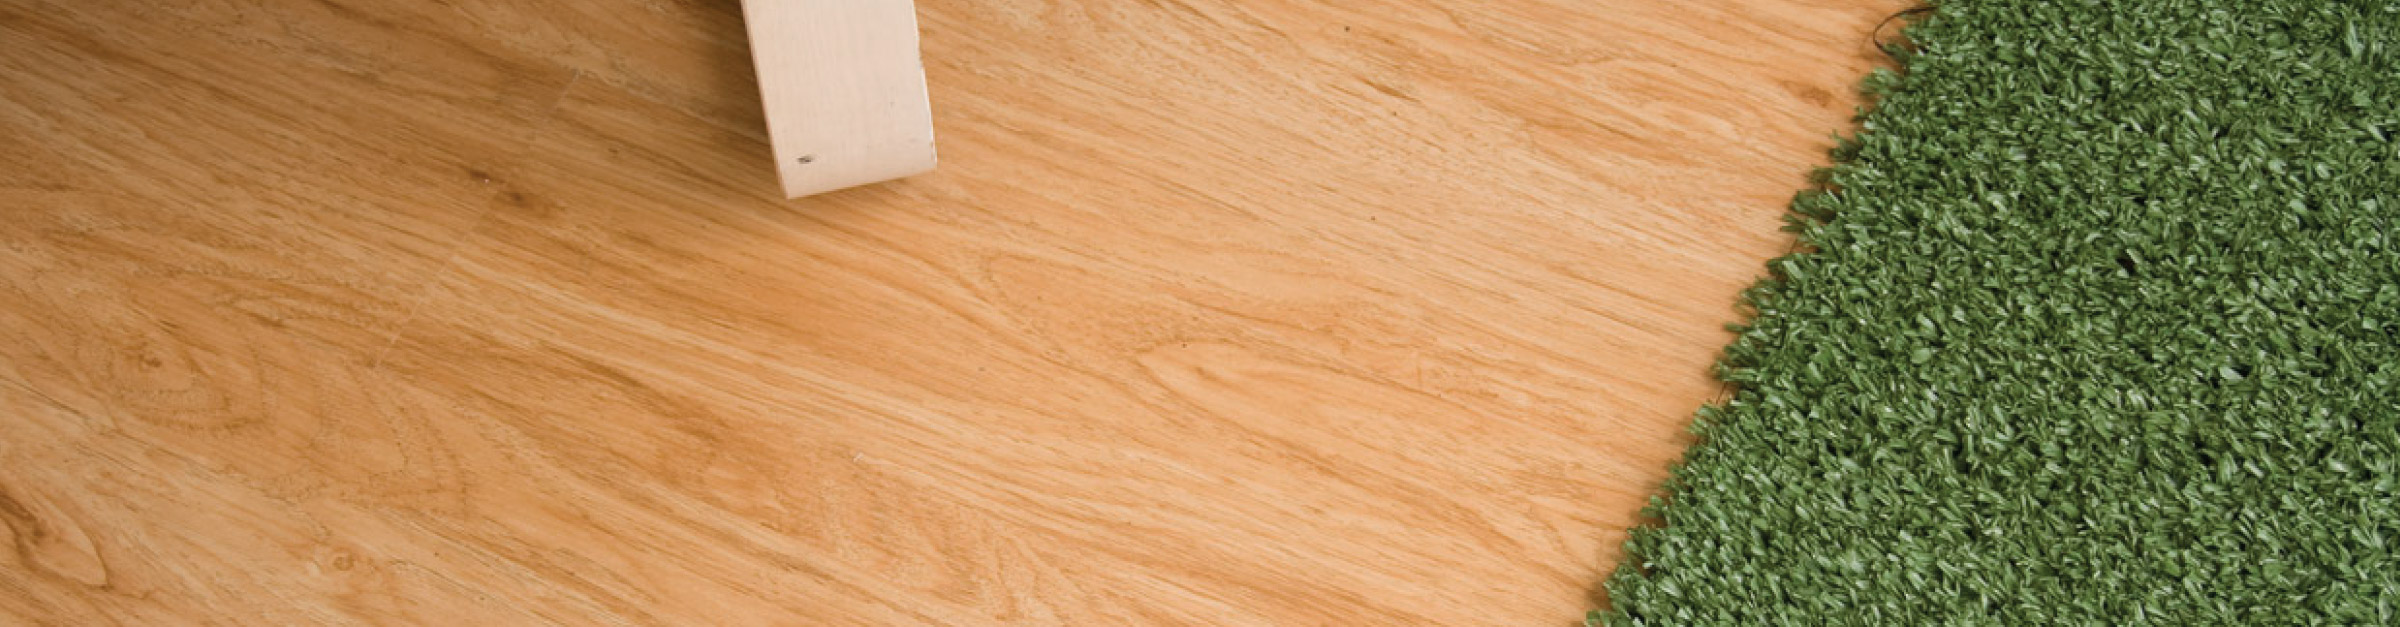 100 horizon laminate flooring sterling dr el cajon ca